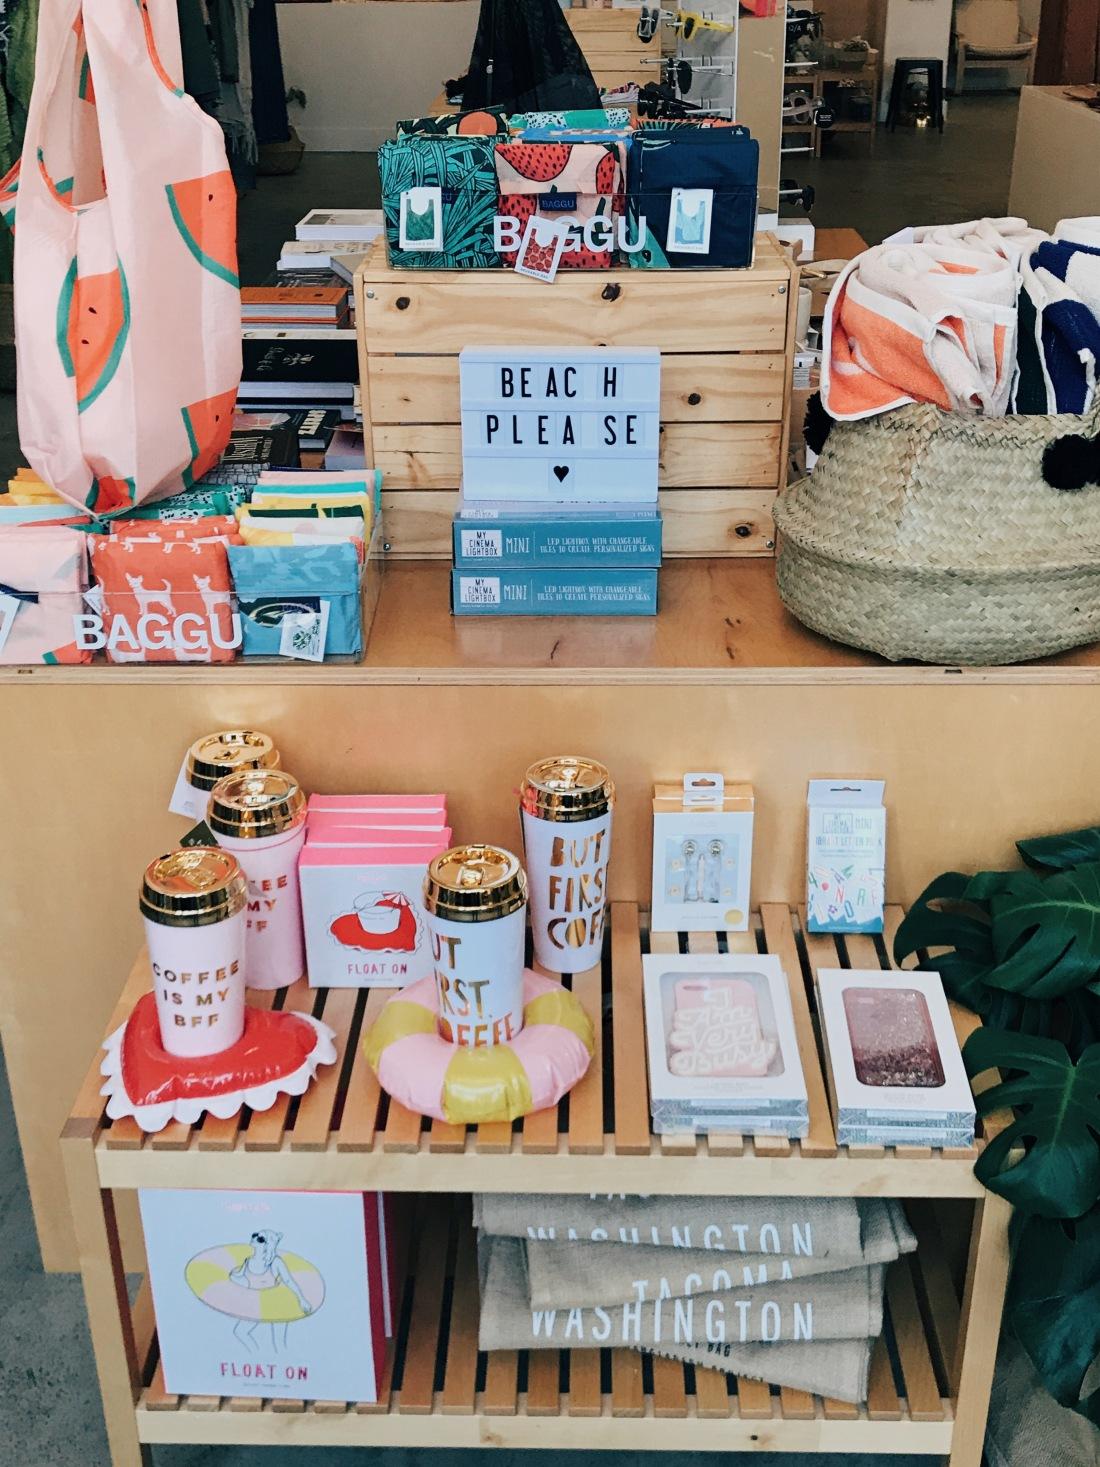 Satori boutique merchandise display